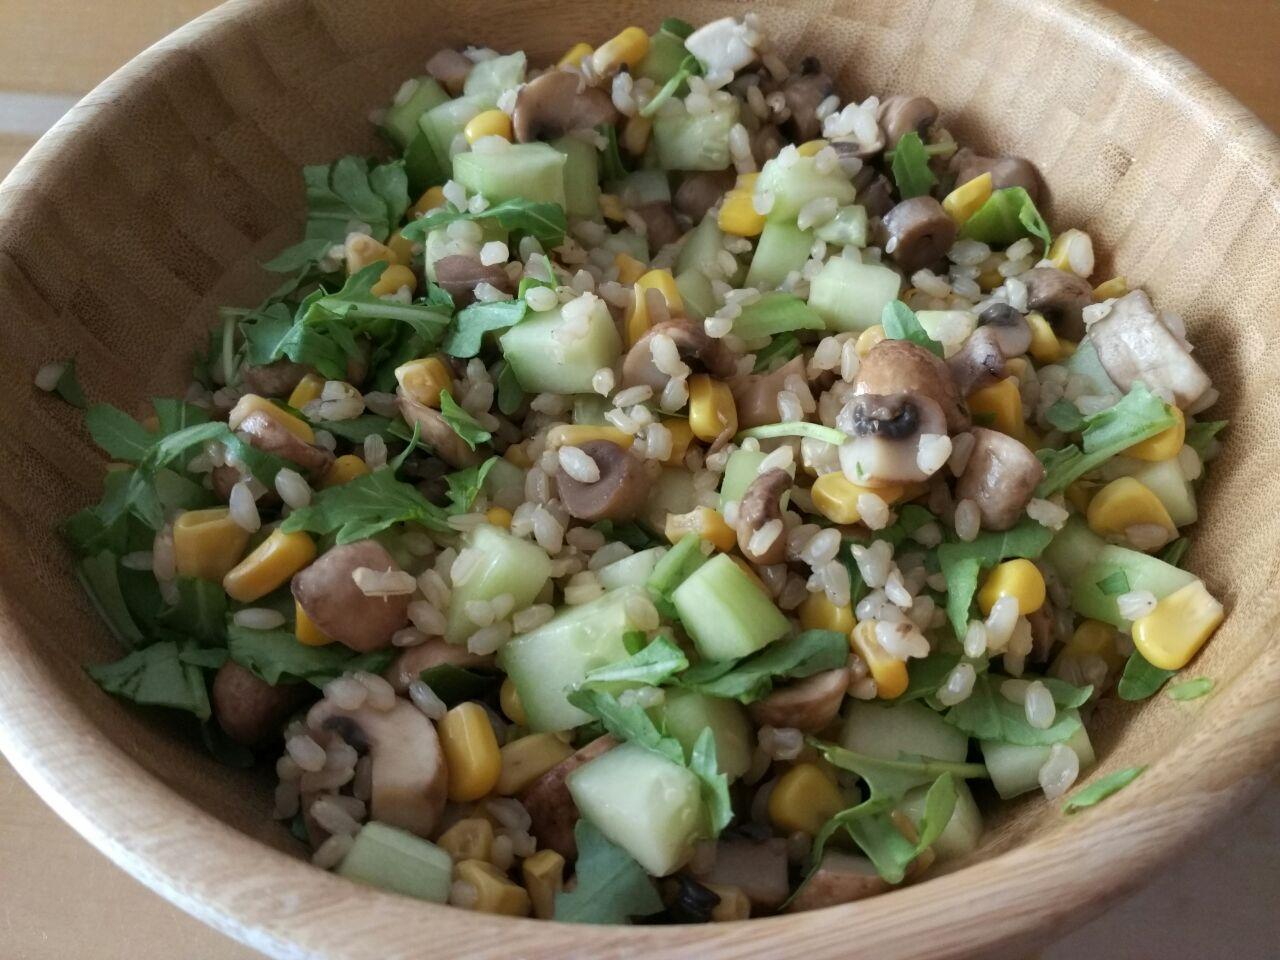 Pin By Nicole Arce On Recipes Recipes Food Peas